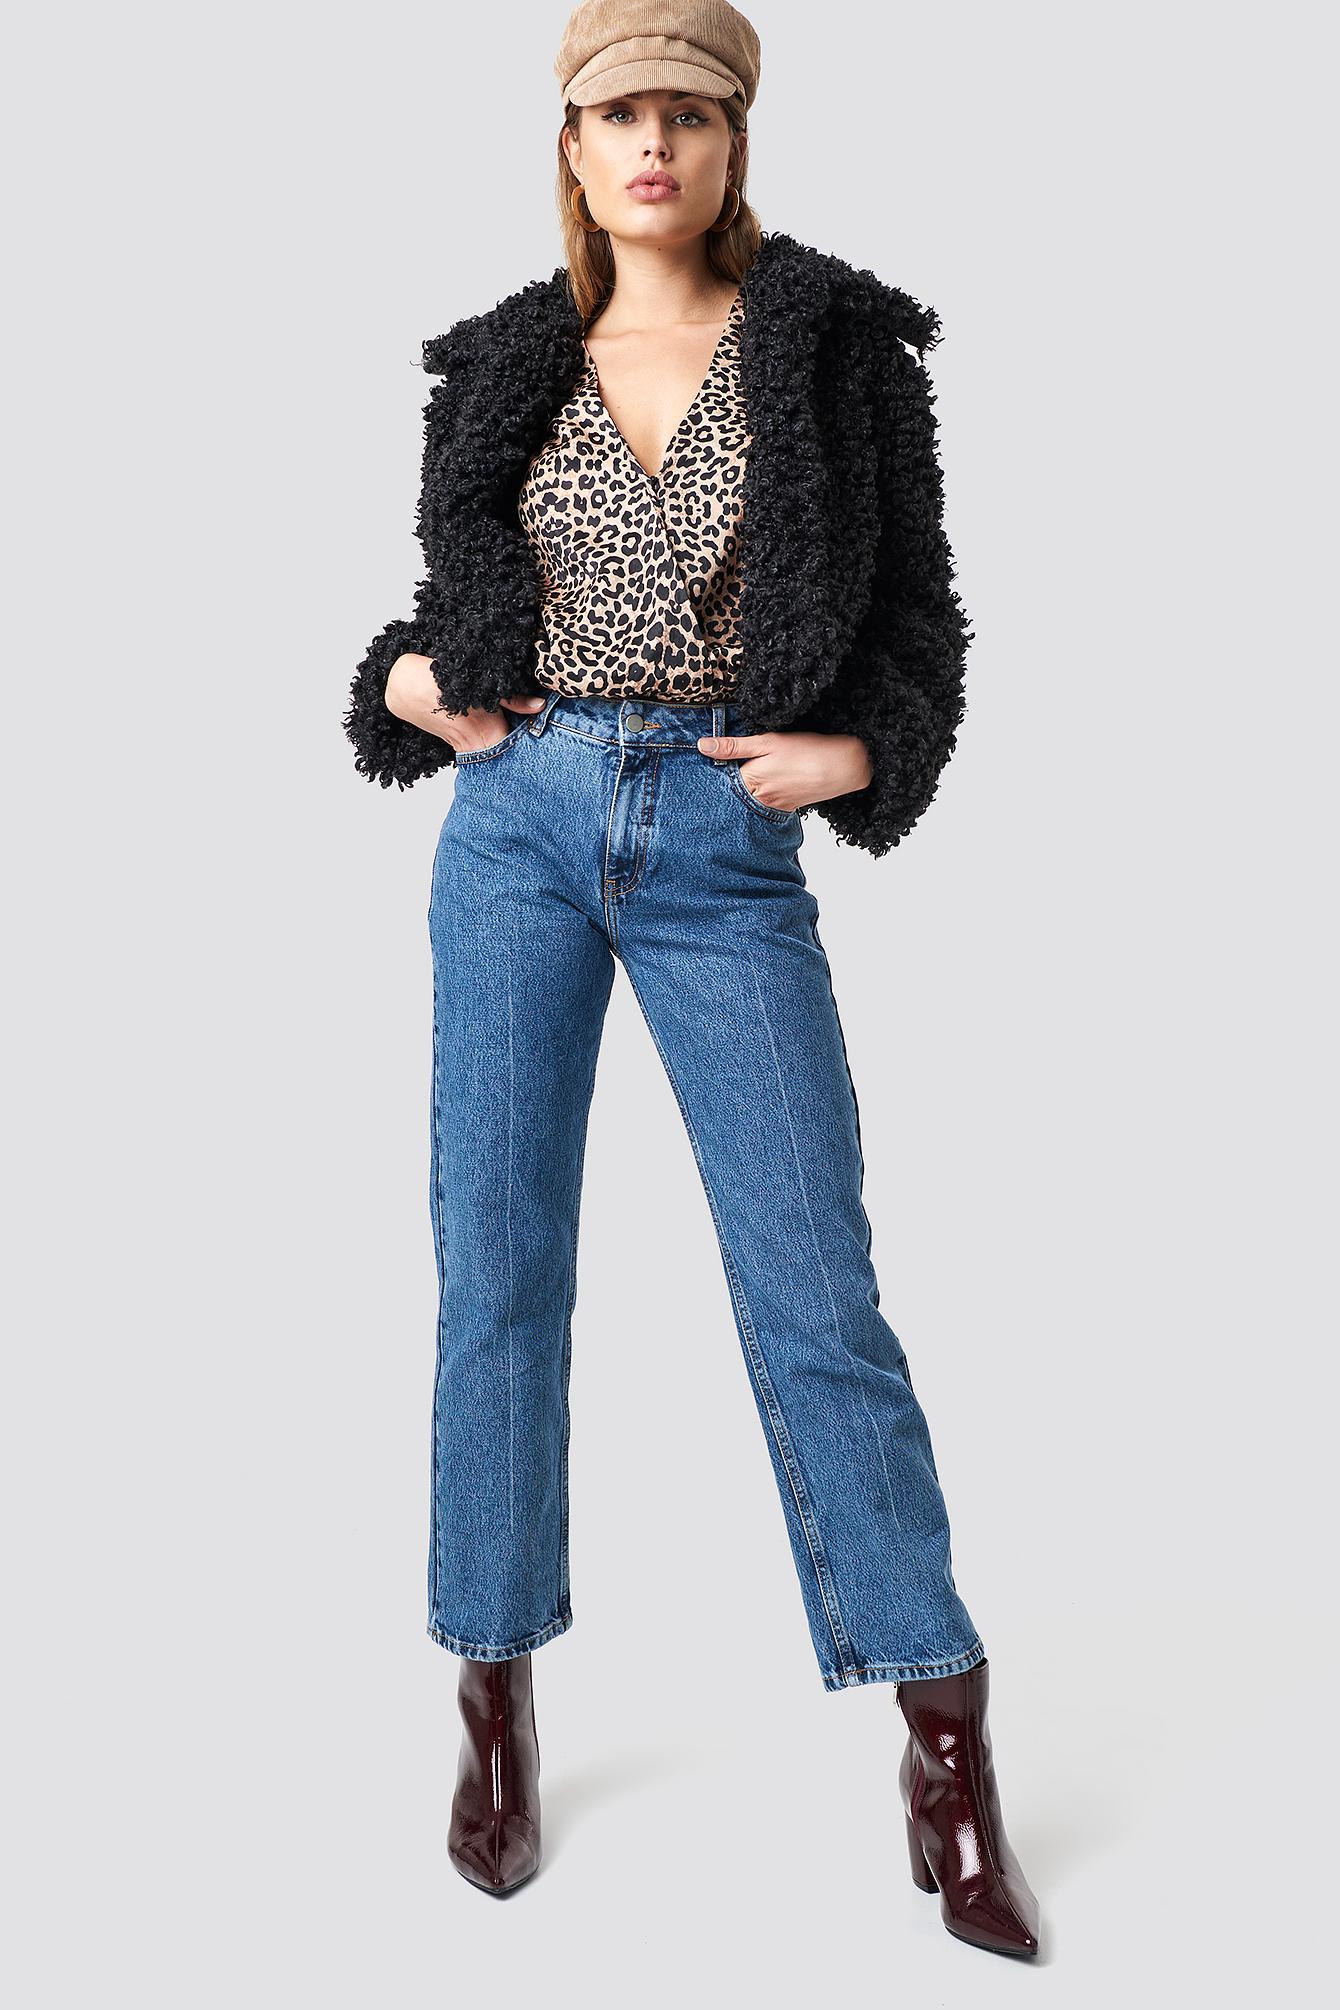 Curly Faux Fur Jacket NA-KD.COM